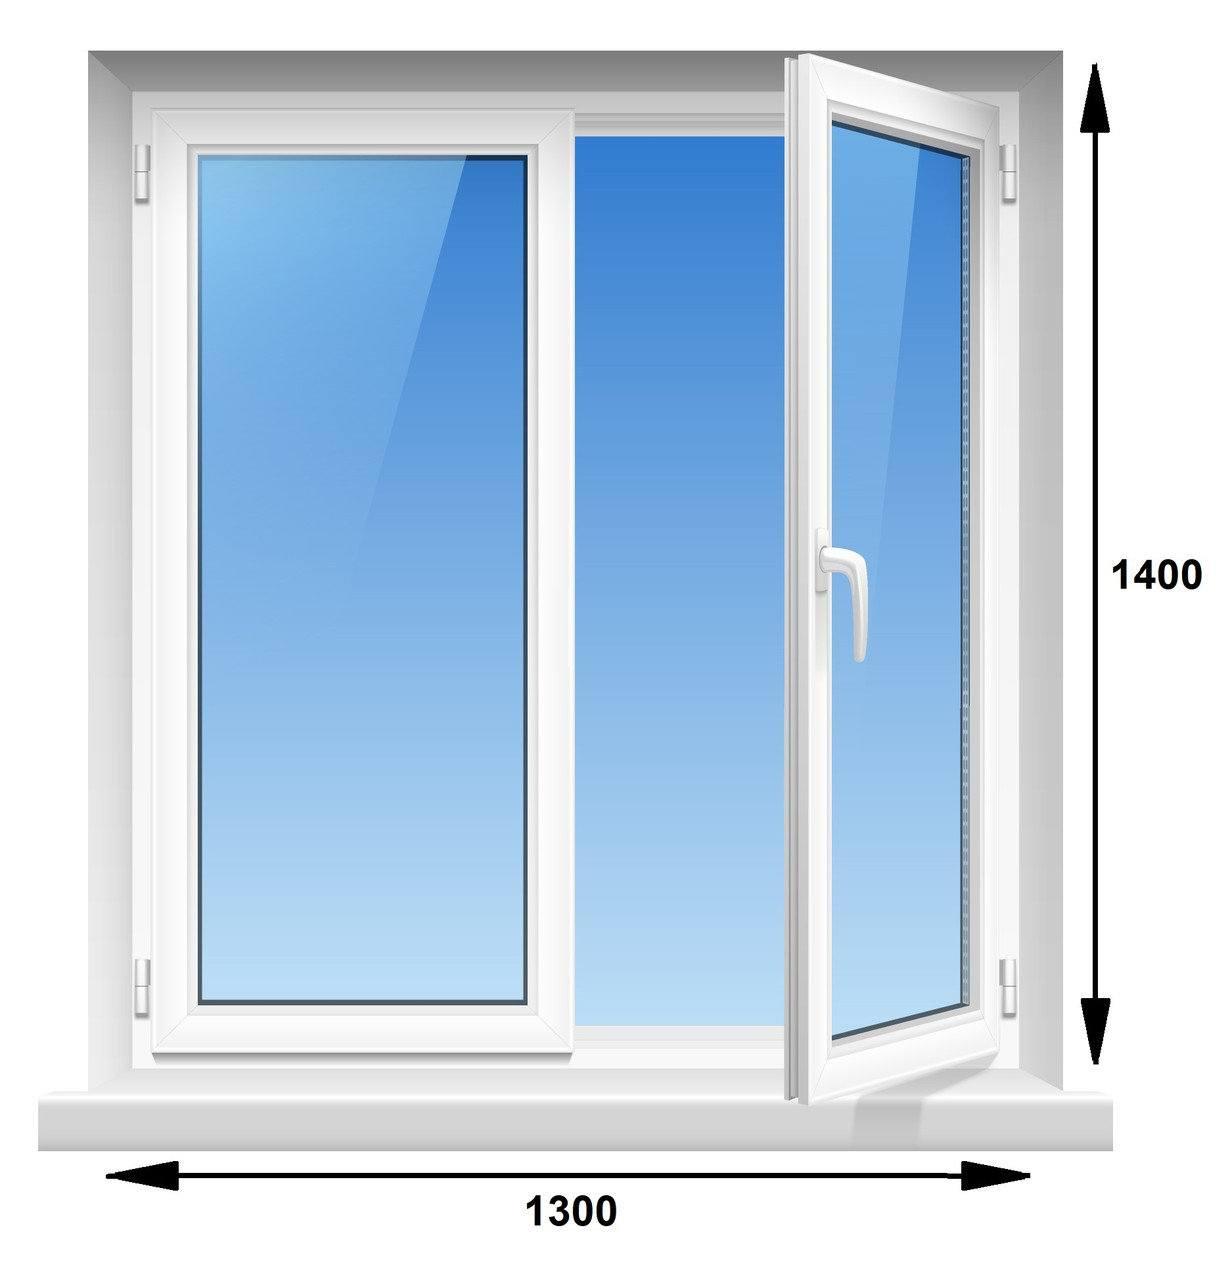 Окно Steko 1300 х 1400